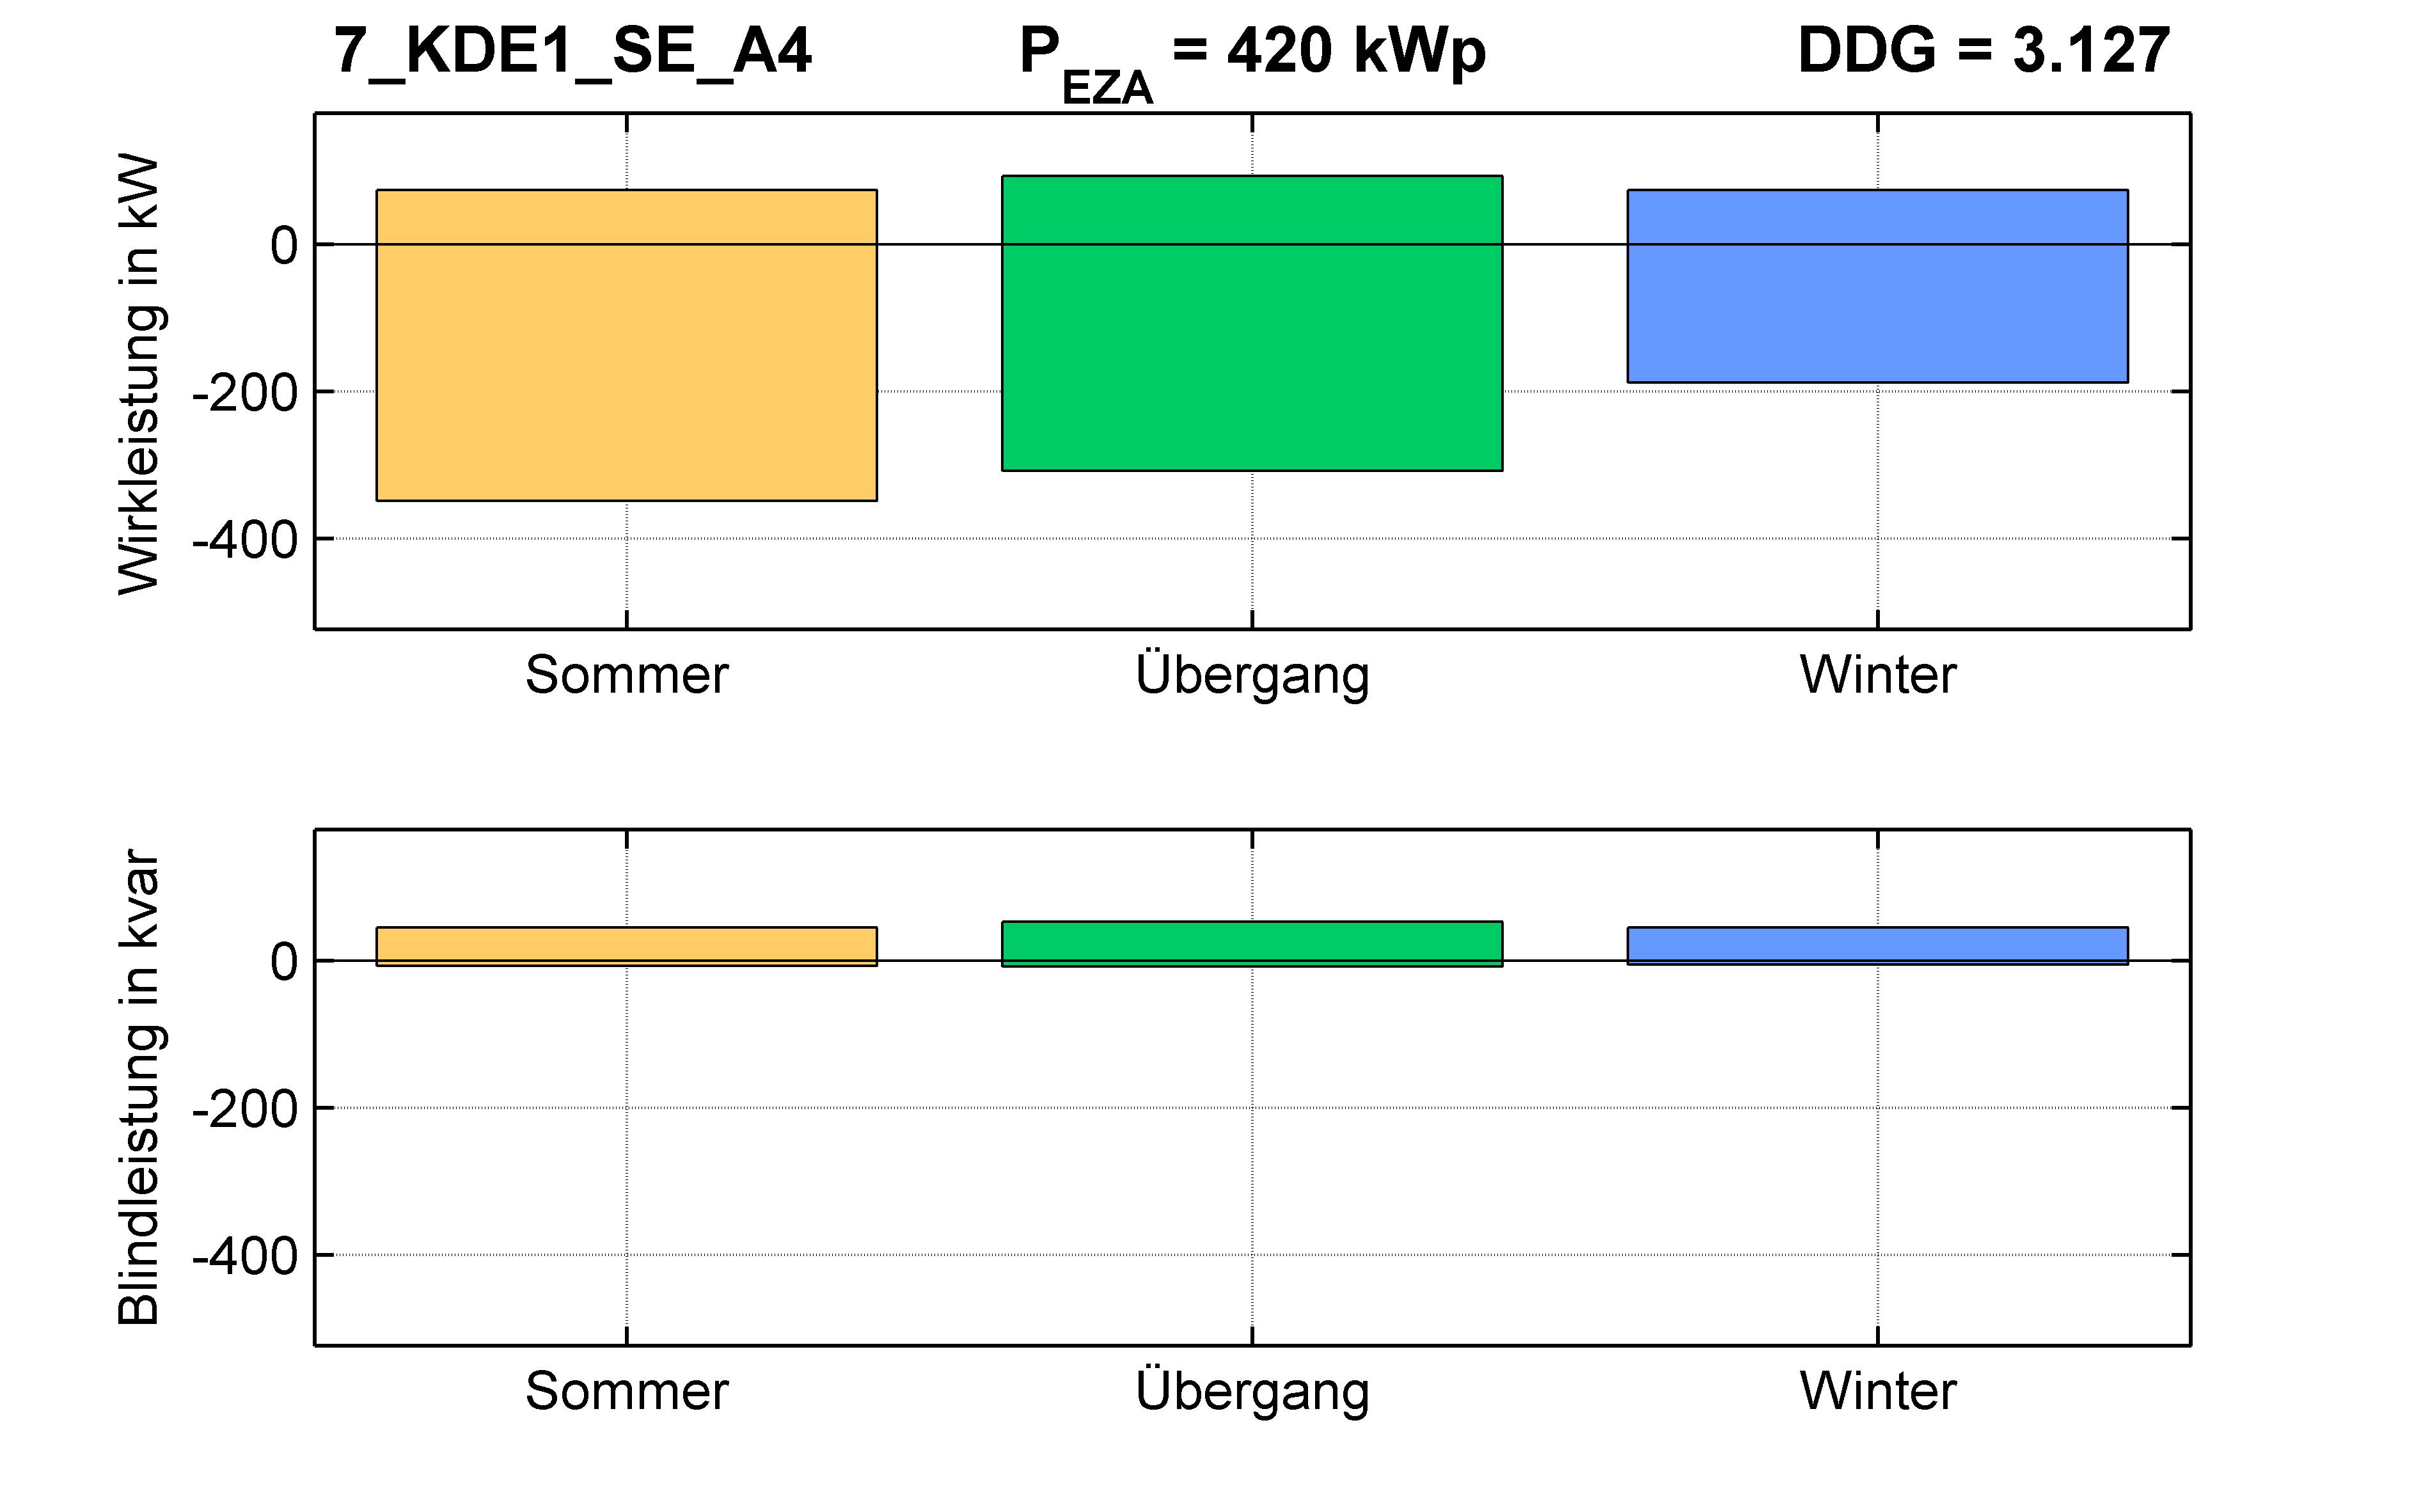 KDE1 | Längsregler (SE) A4 | PQ-Bilanz